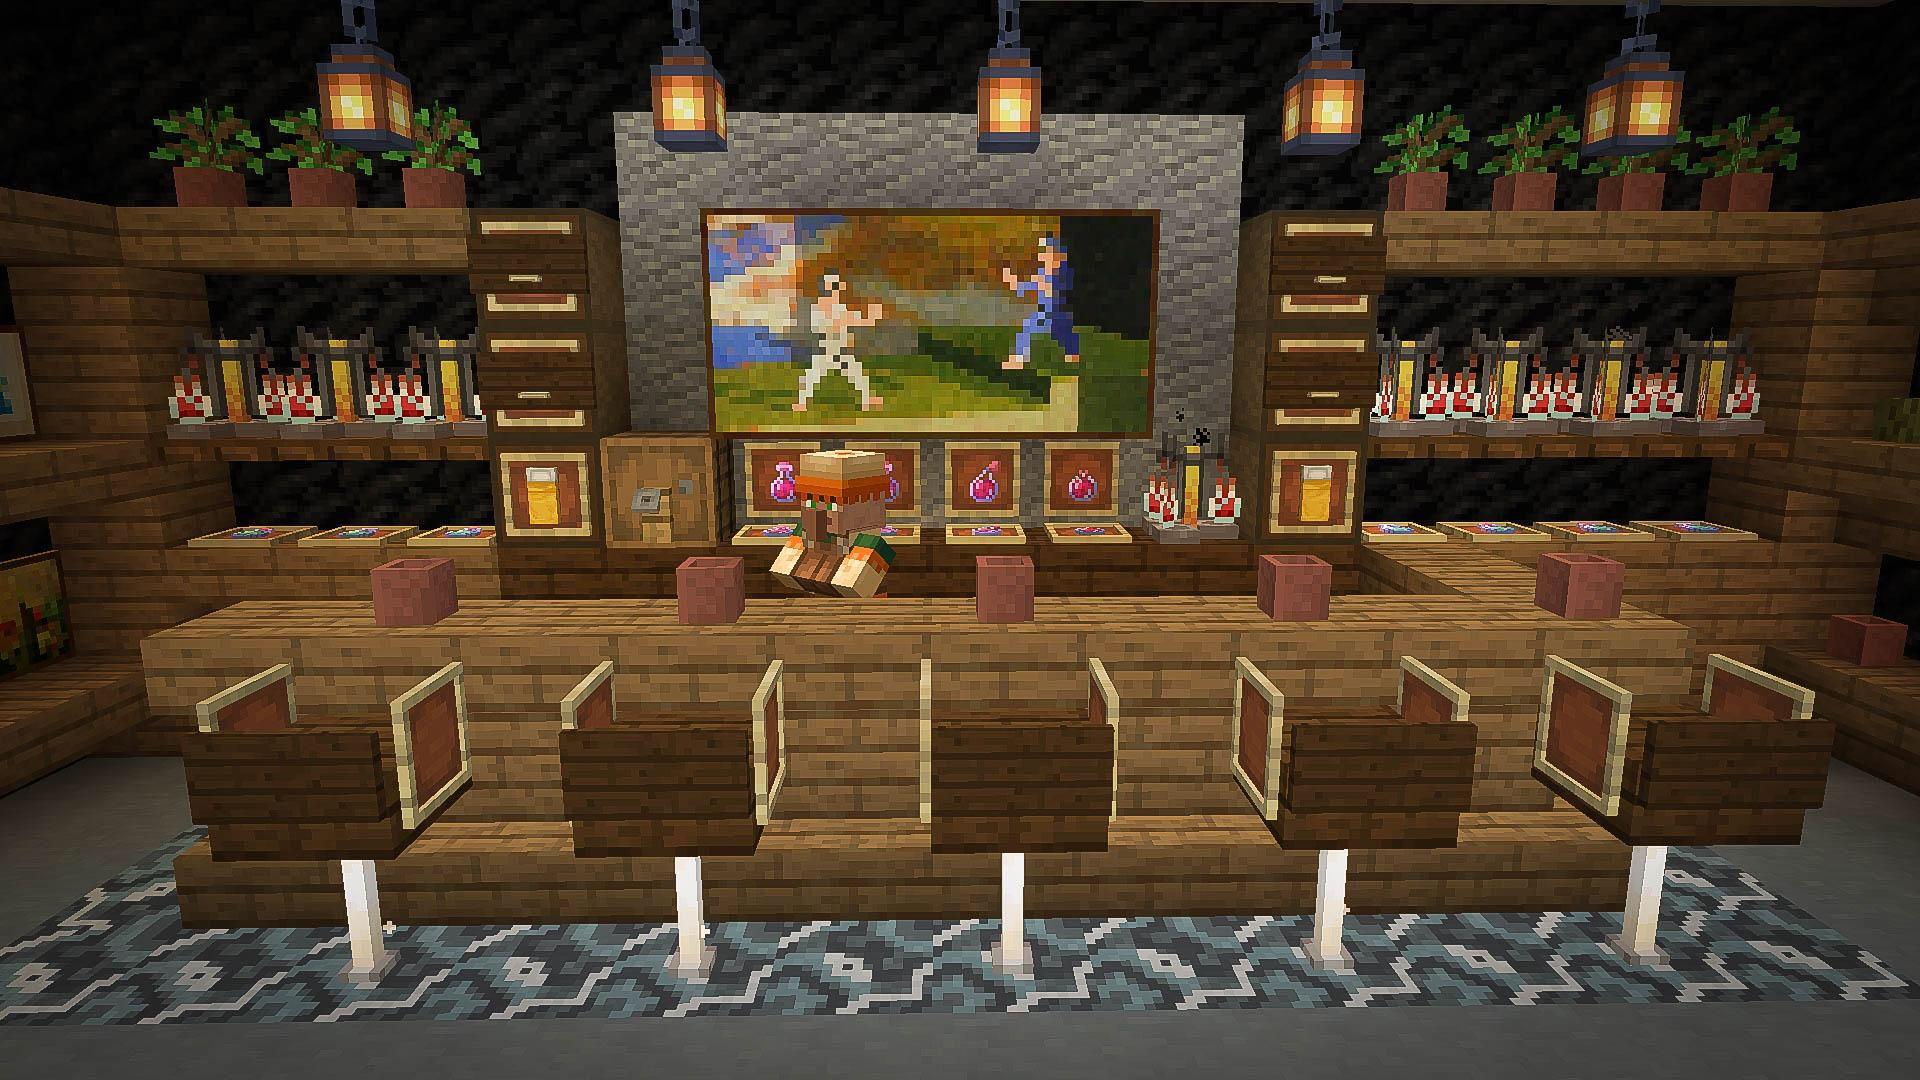 Minecraft Bar Minecraft Decorations Minecraft Room Minecraft Designs